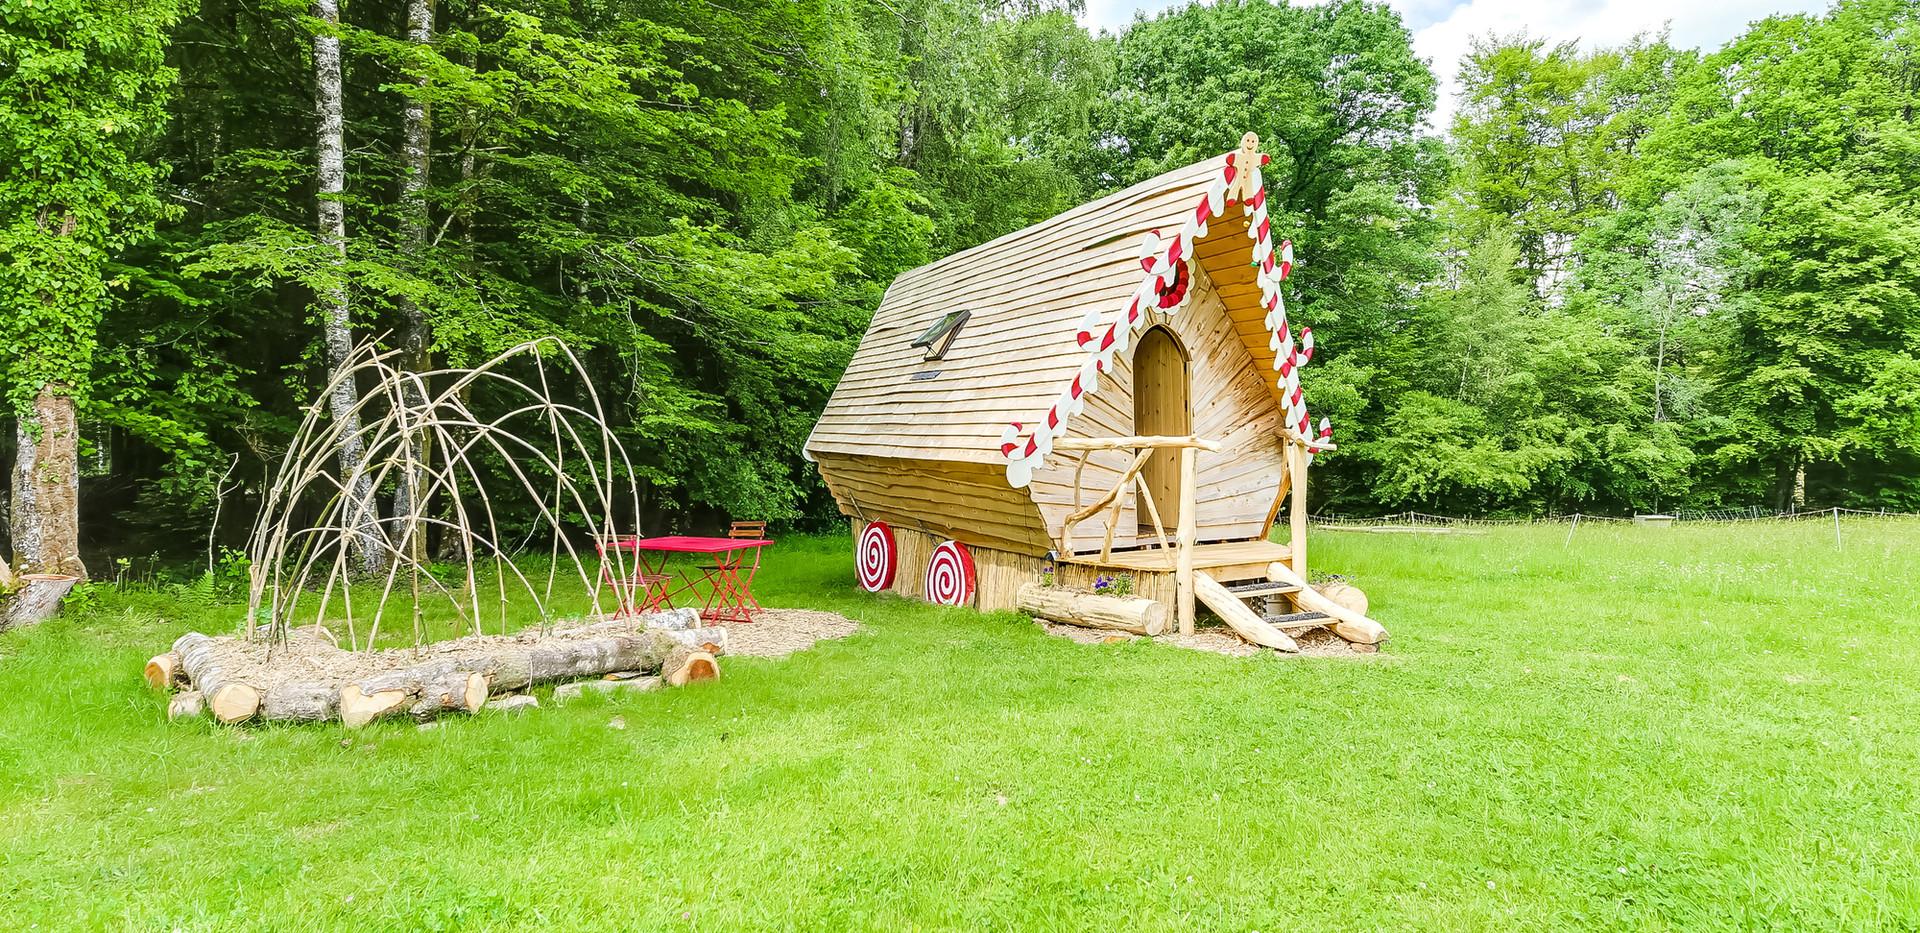 cabane Hansele et gretel